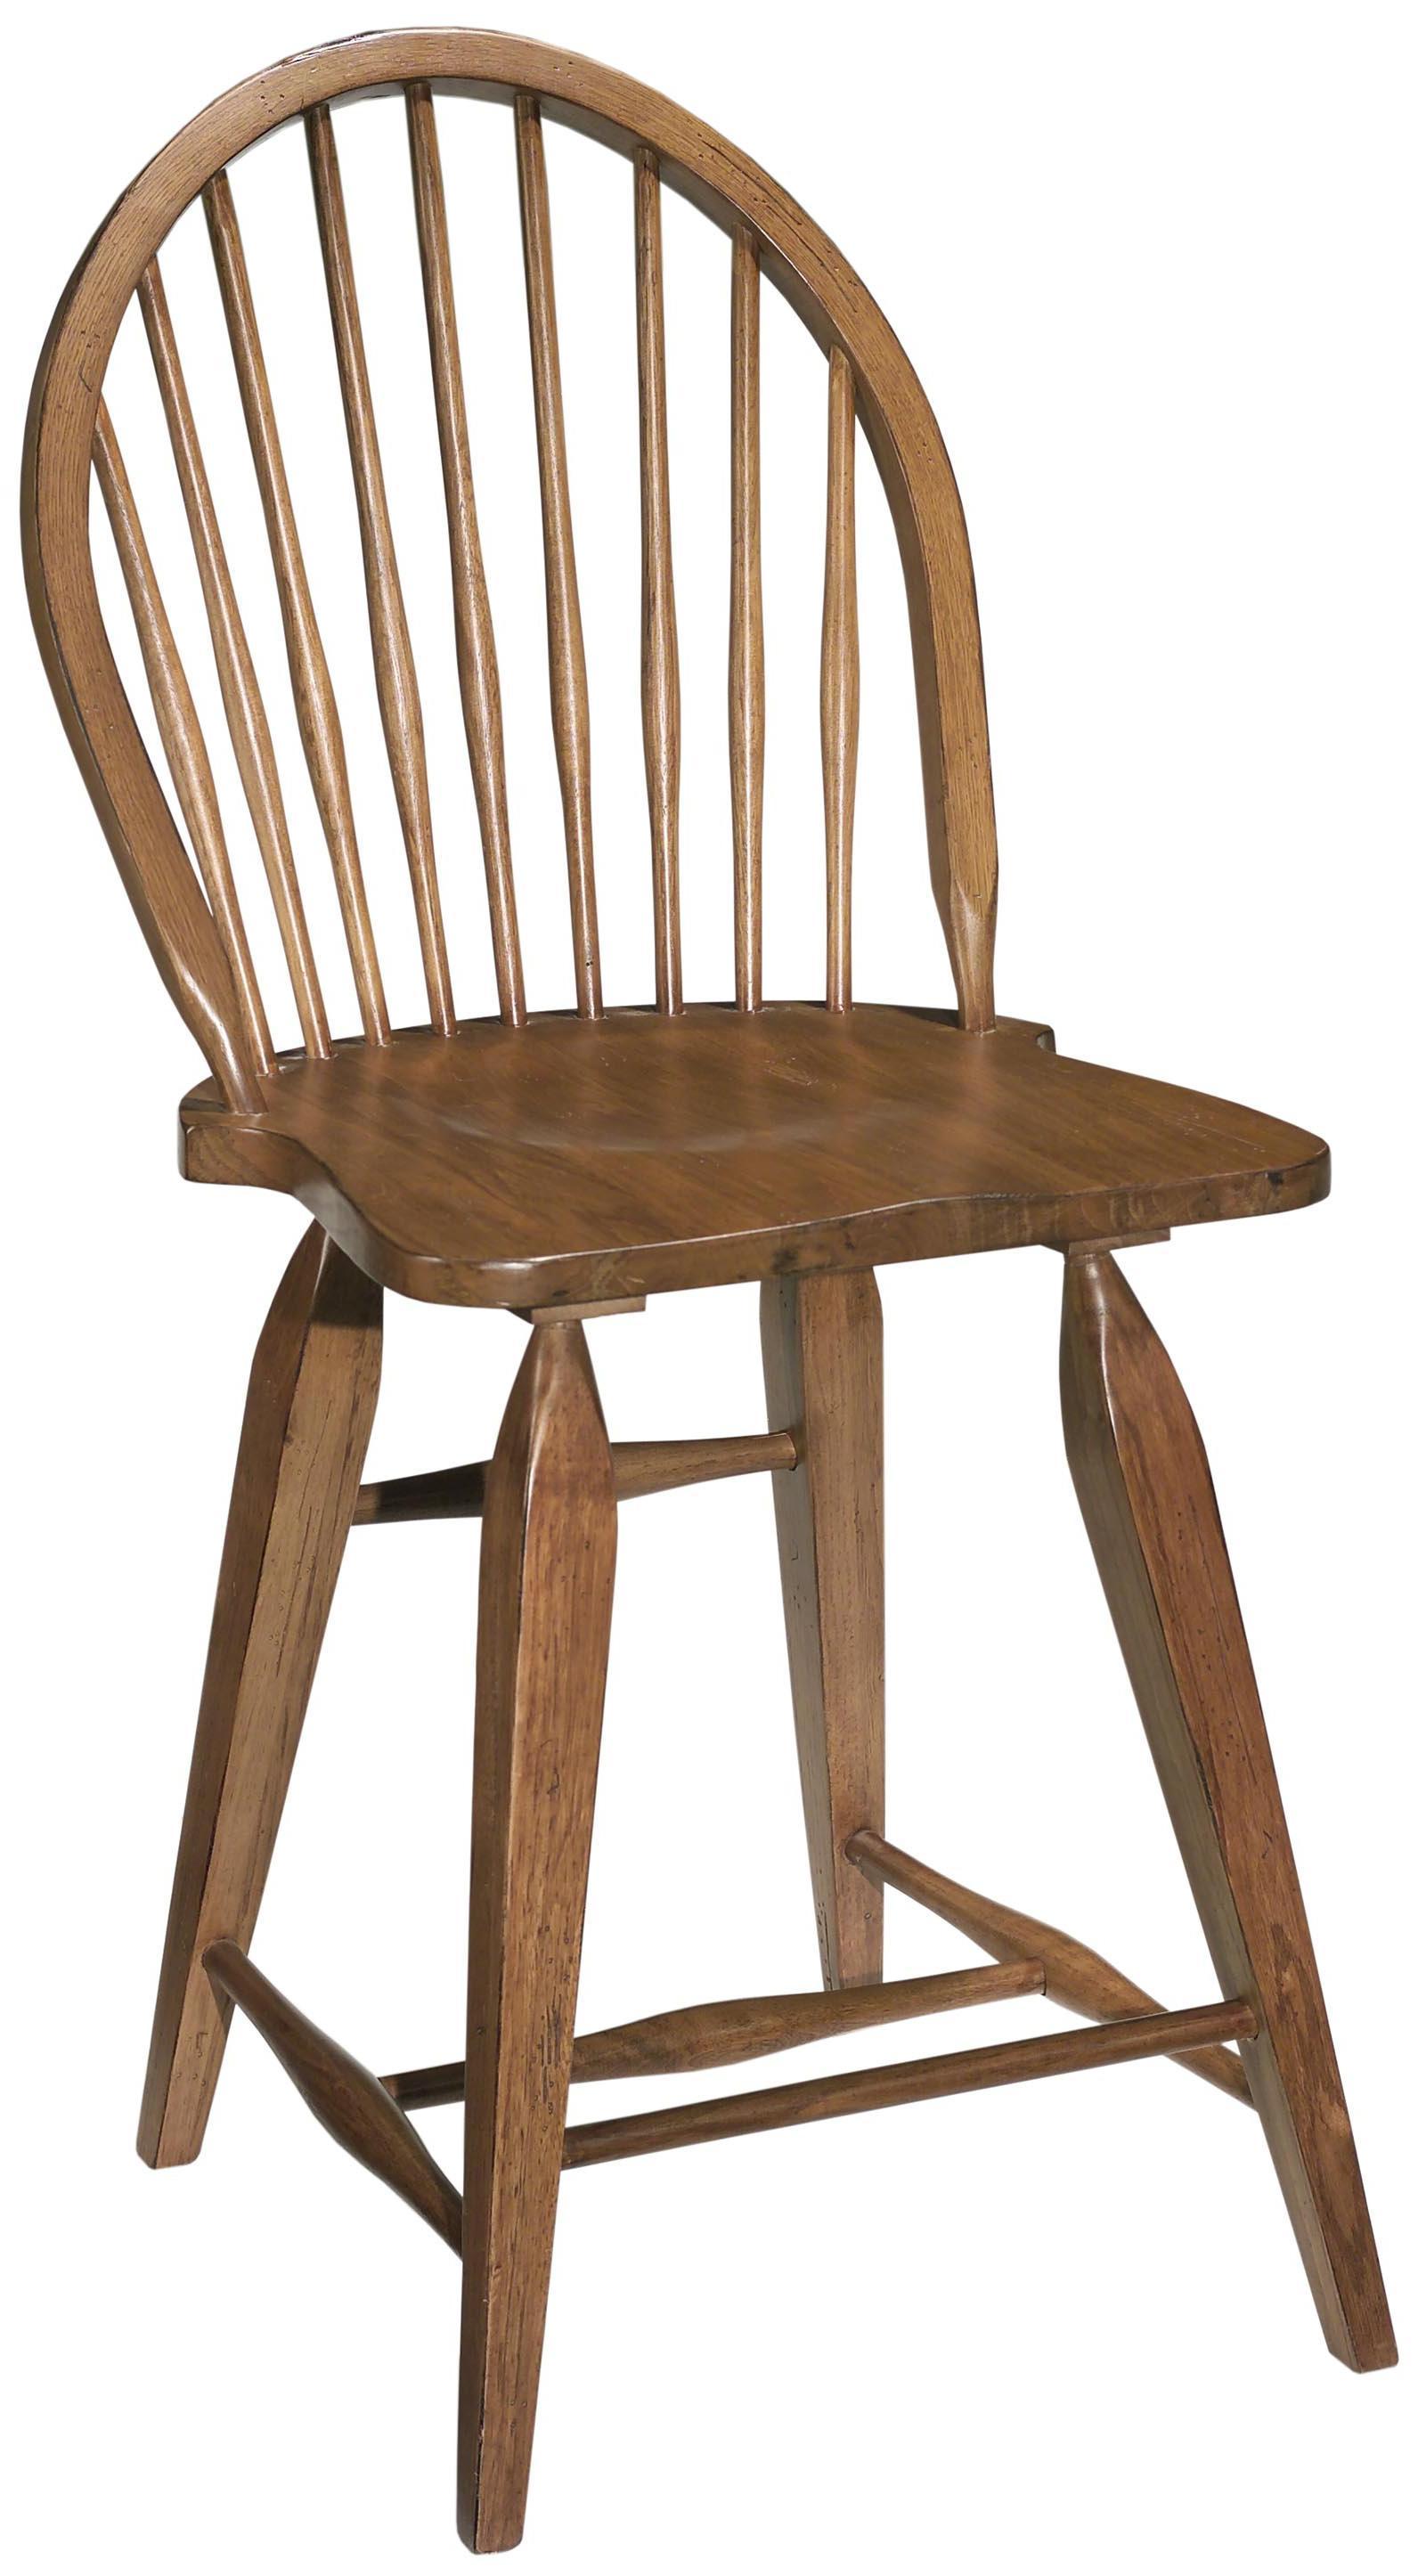 Broyhill attic heirloom bedroom furniture 2017 2018 for Furniture for attics